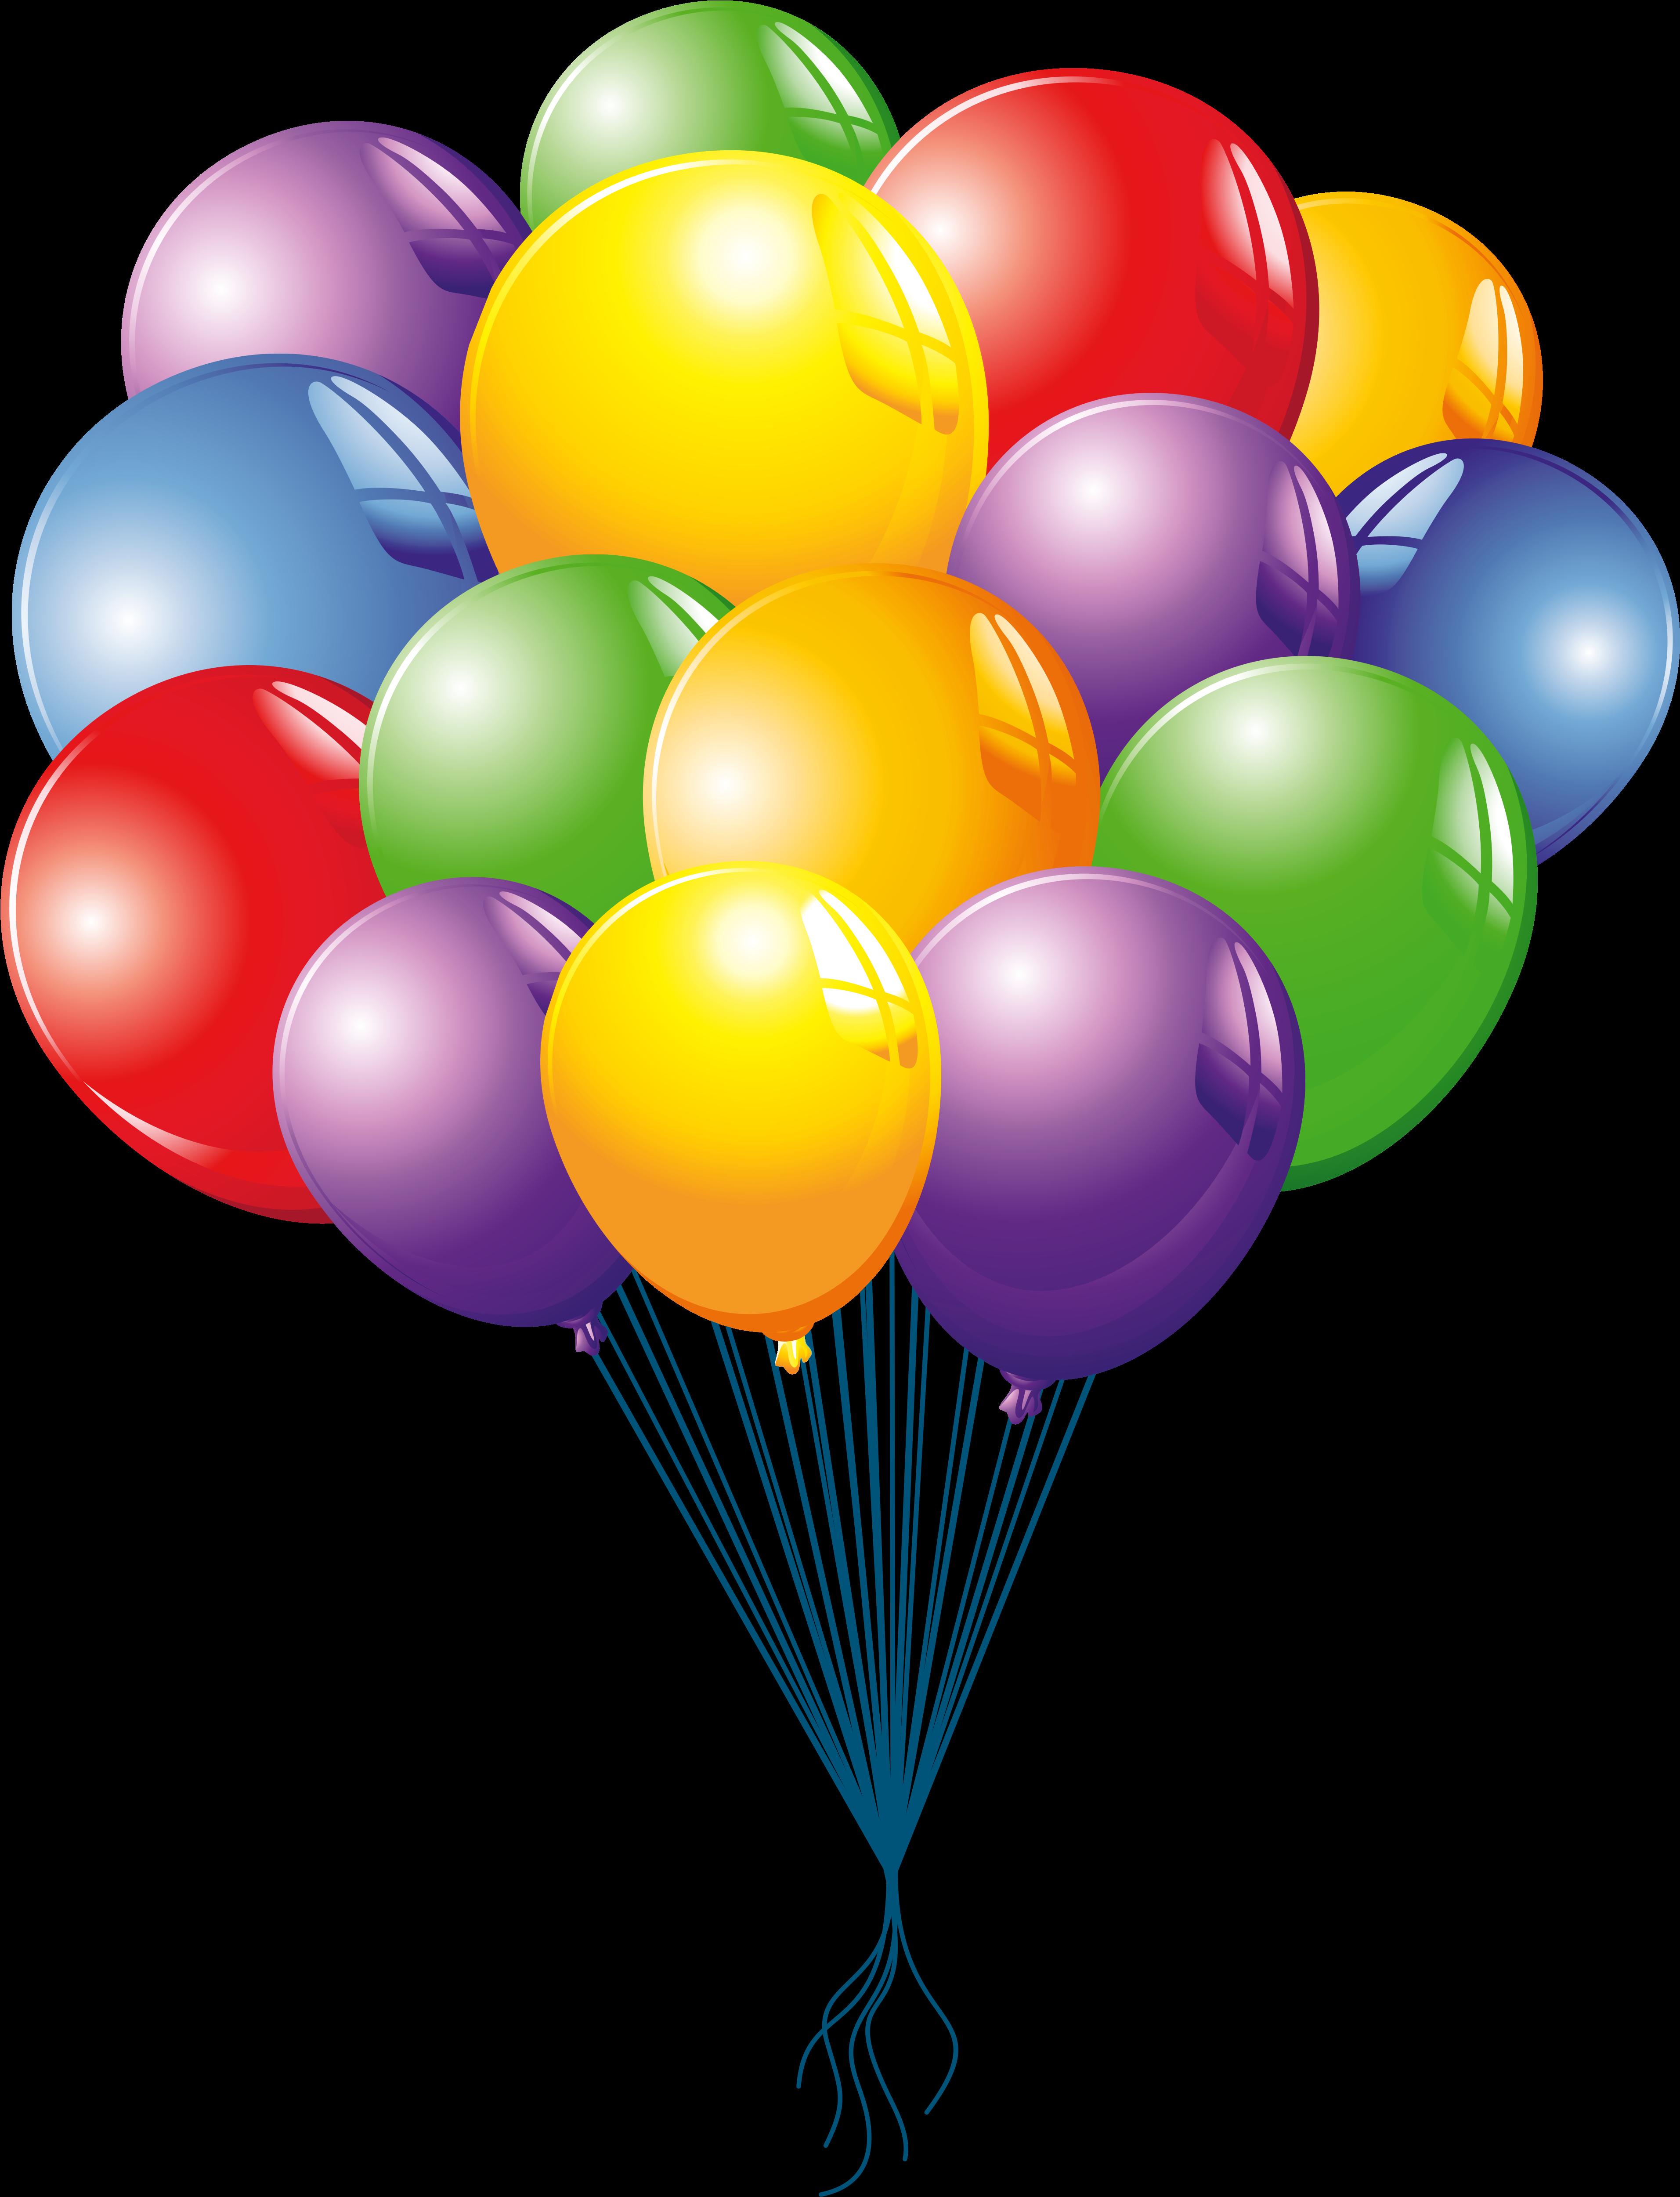 Transparent balloon clipart - Balloon Box, Love Balloon, Balloon Clipart, Word Pictures, - Balloon Clipart